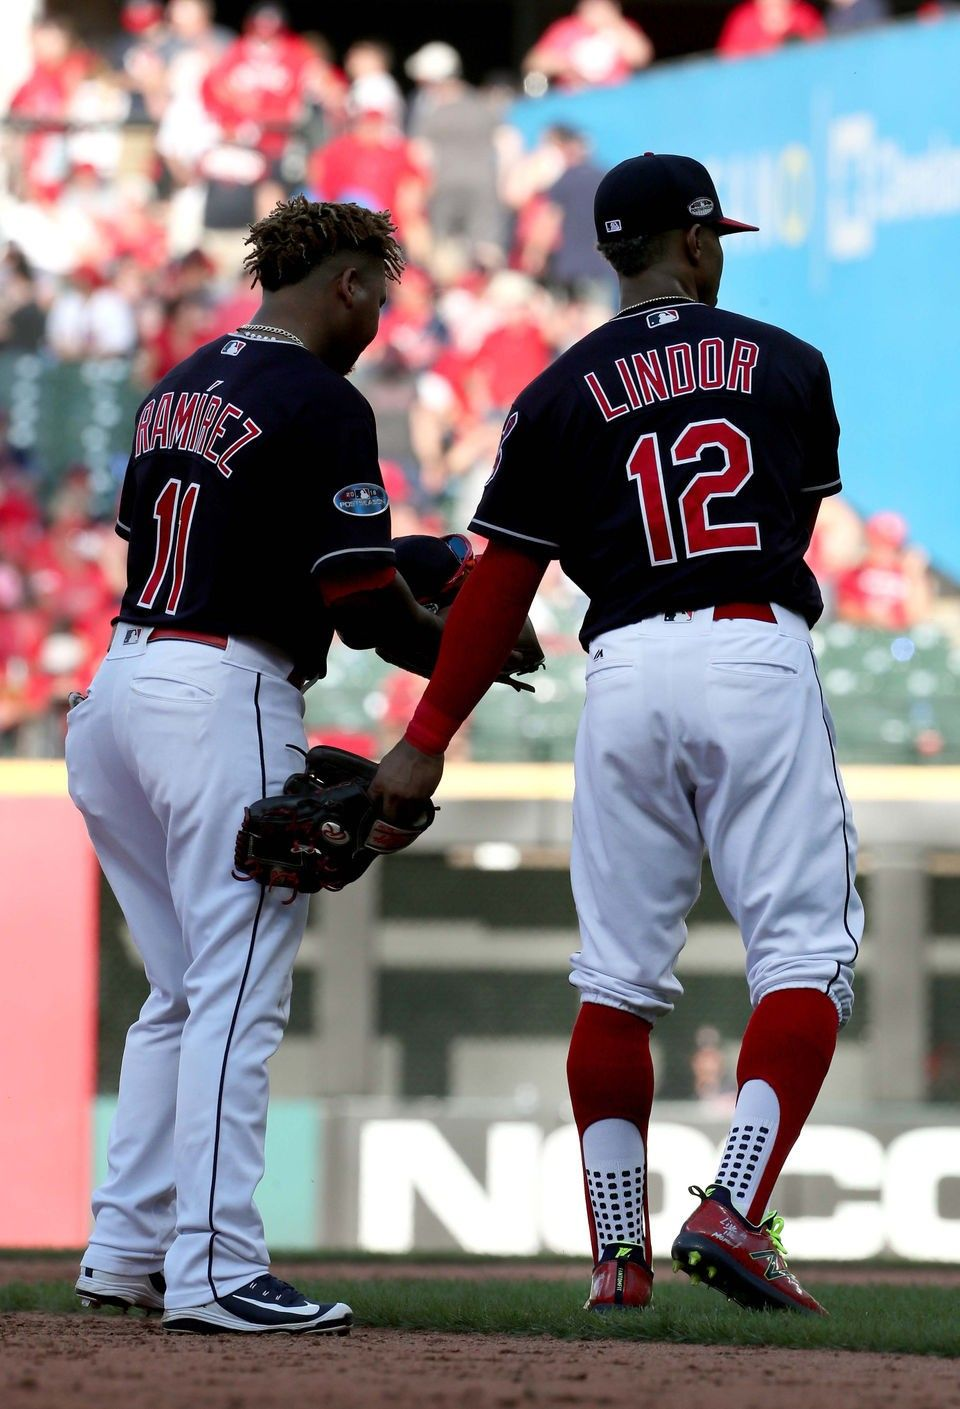 Cleveland Indians Francisco Lindor and Jose Ramirez during